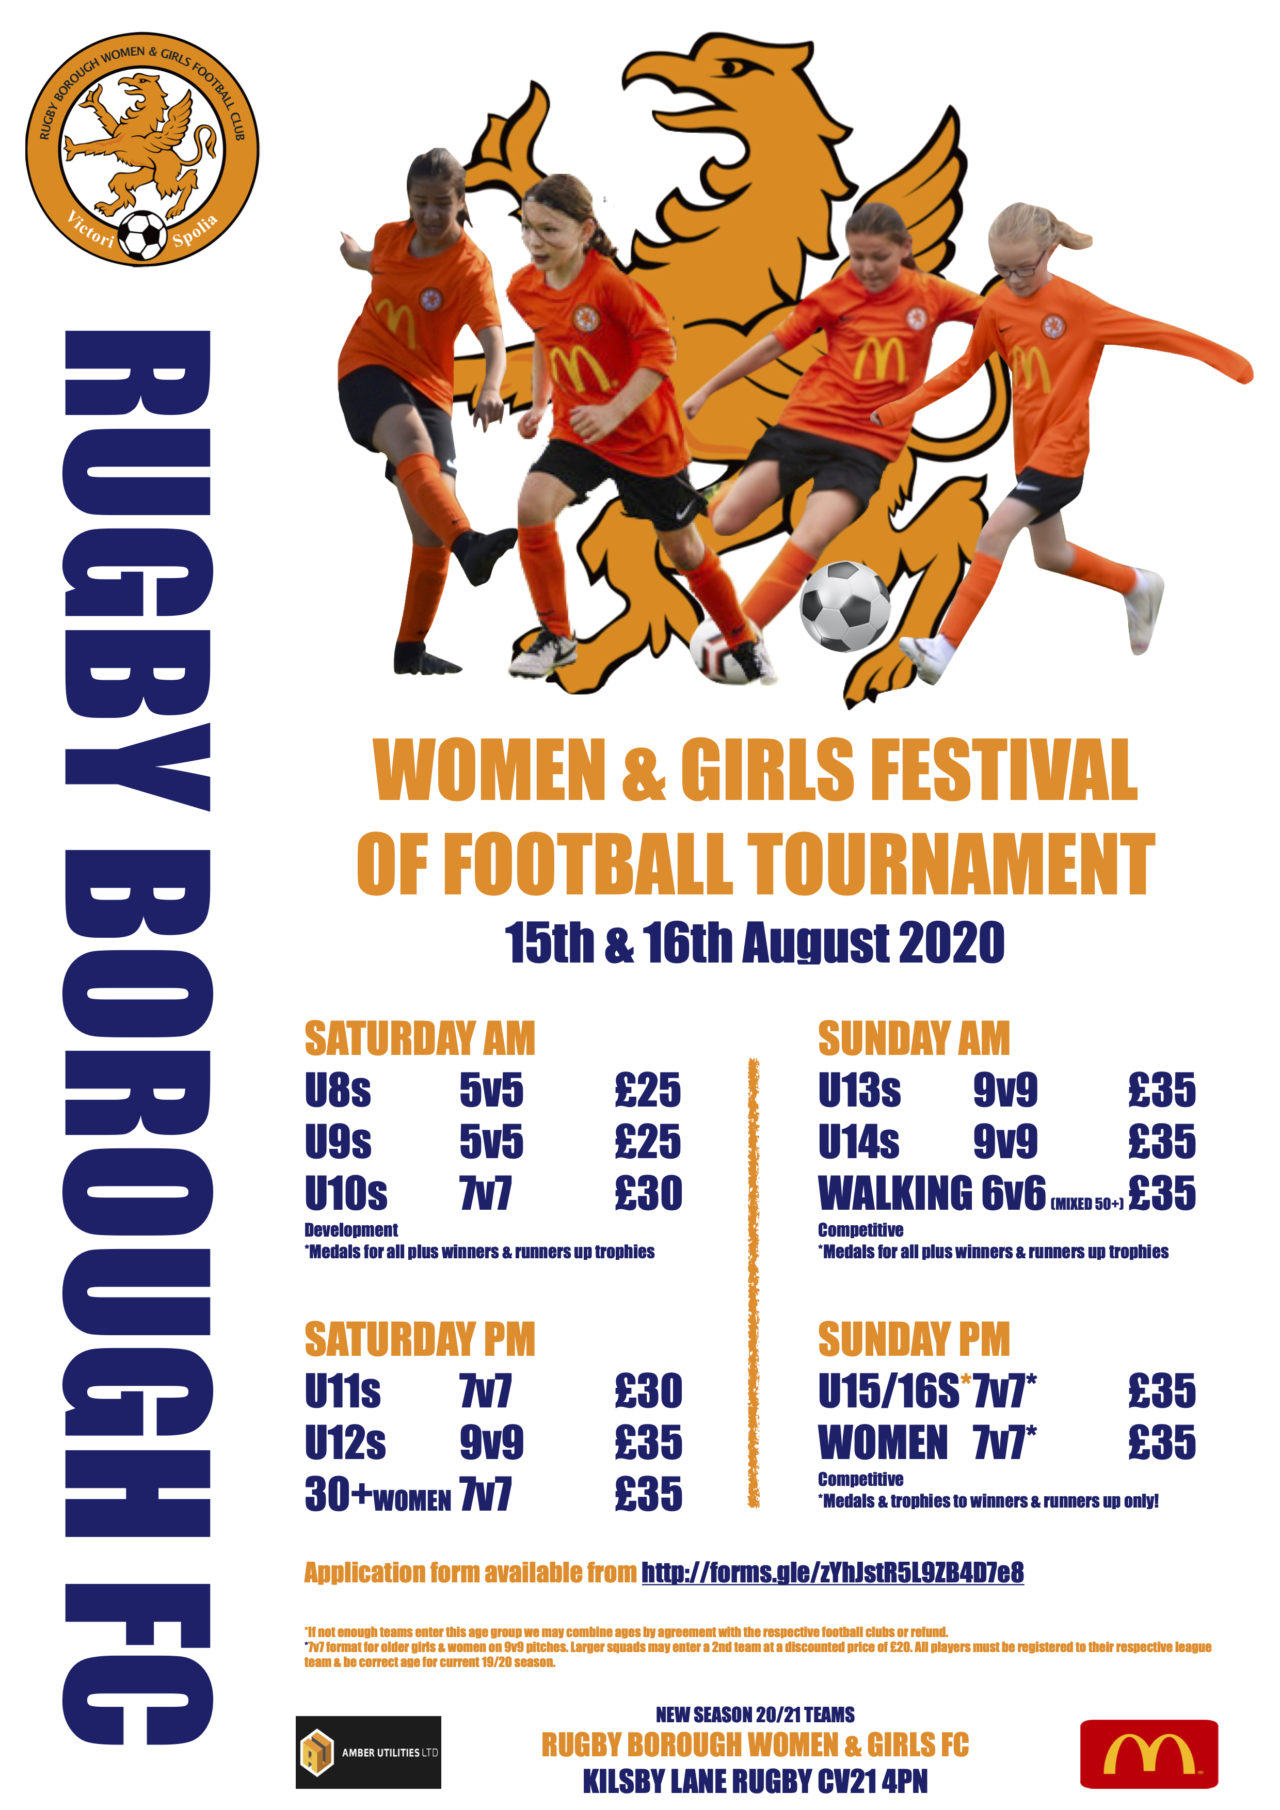 Rugby Borough Women & Girls Festival of Football 2020 | Rugby Borough FC